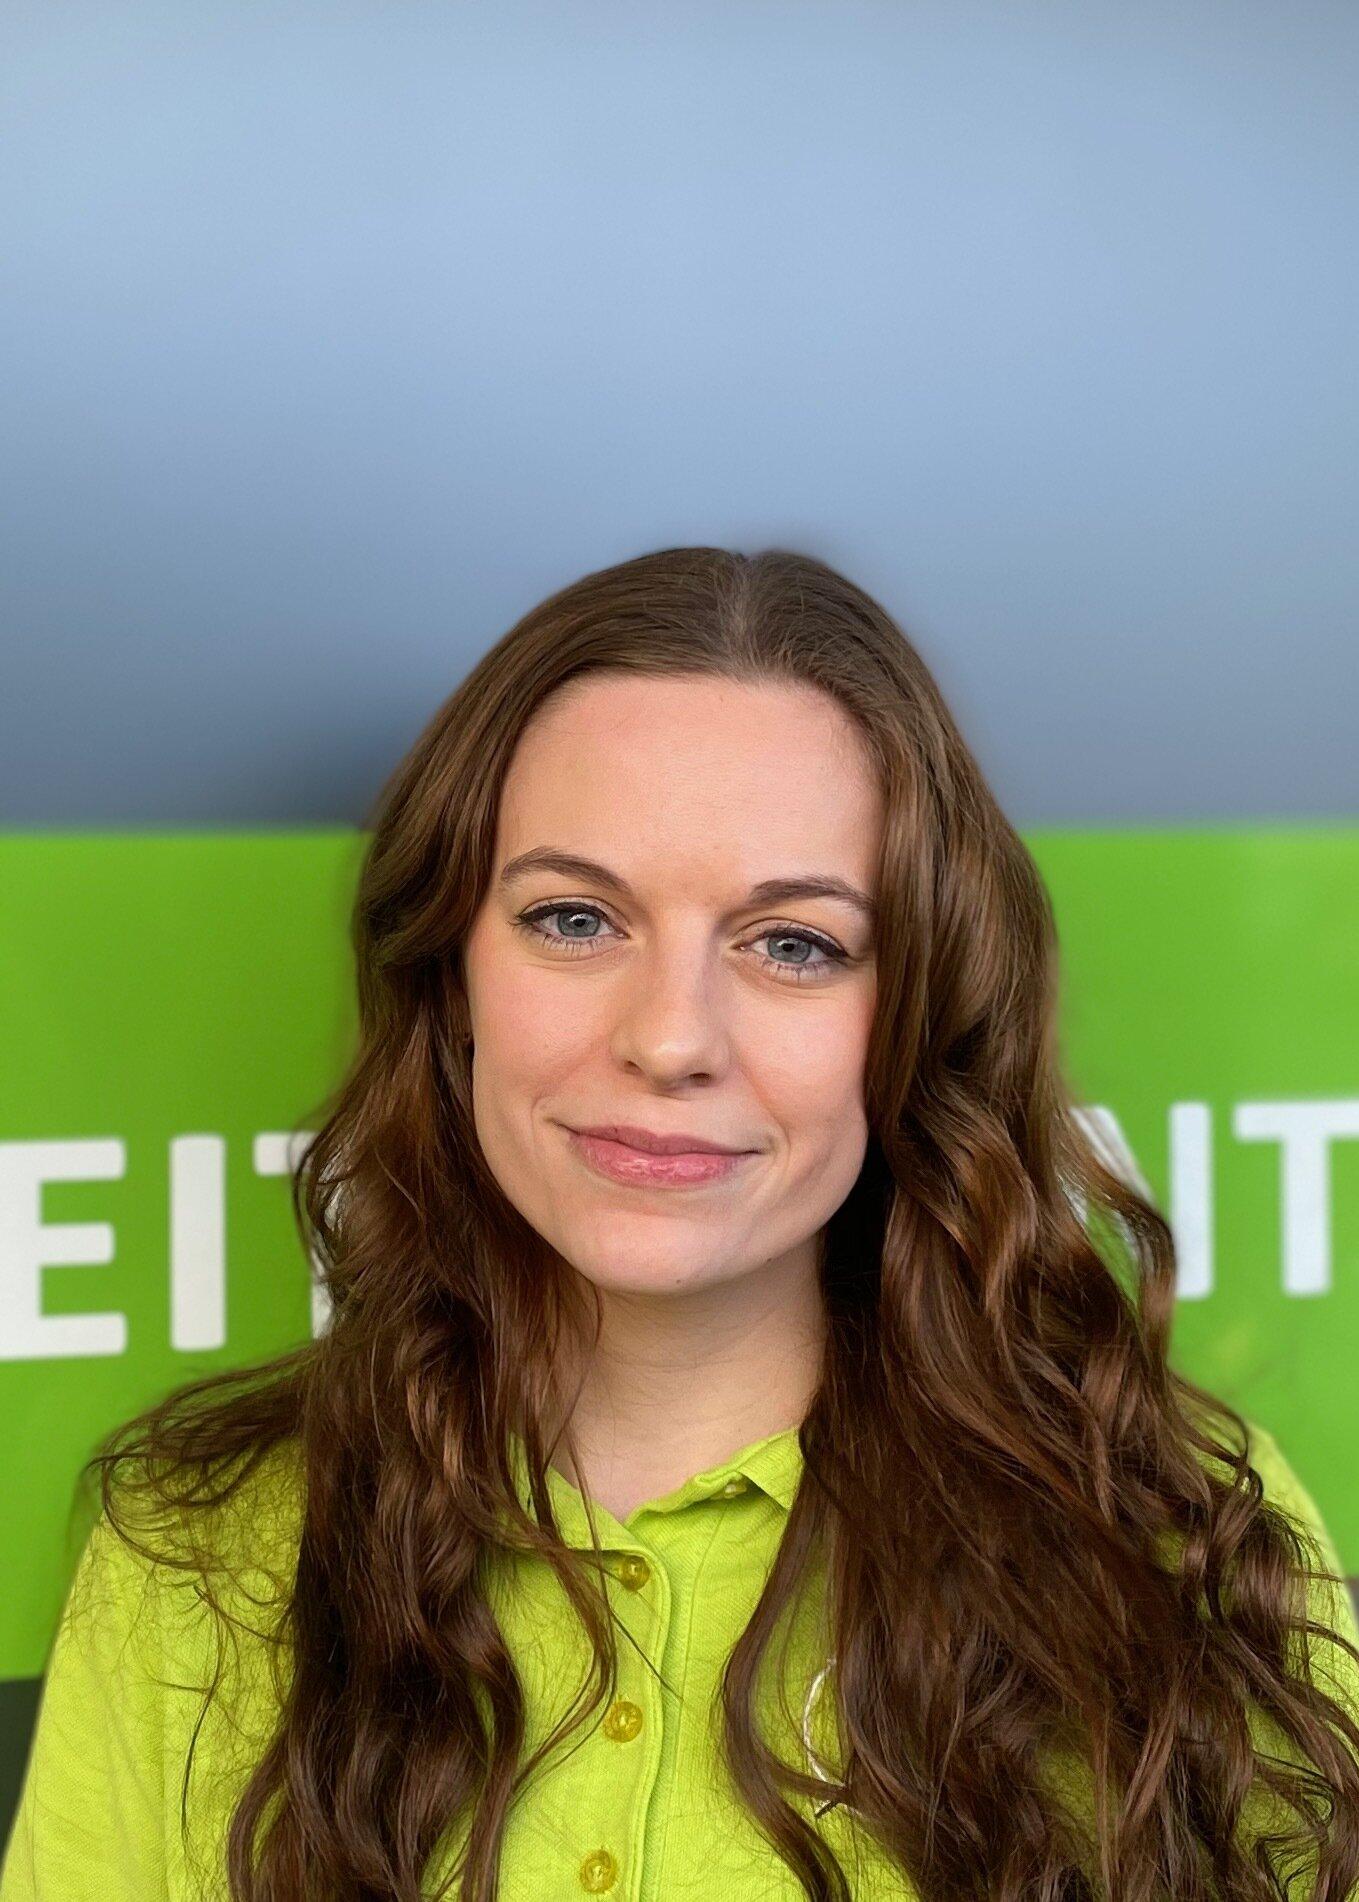 Alina Hildebrandt